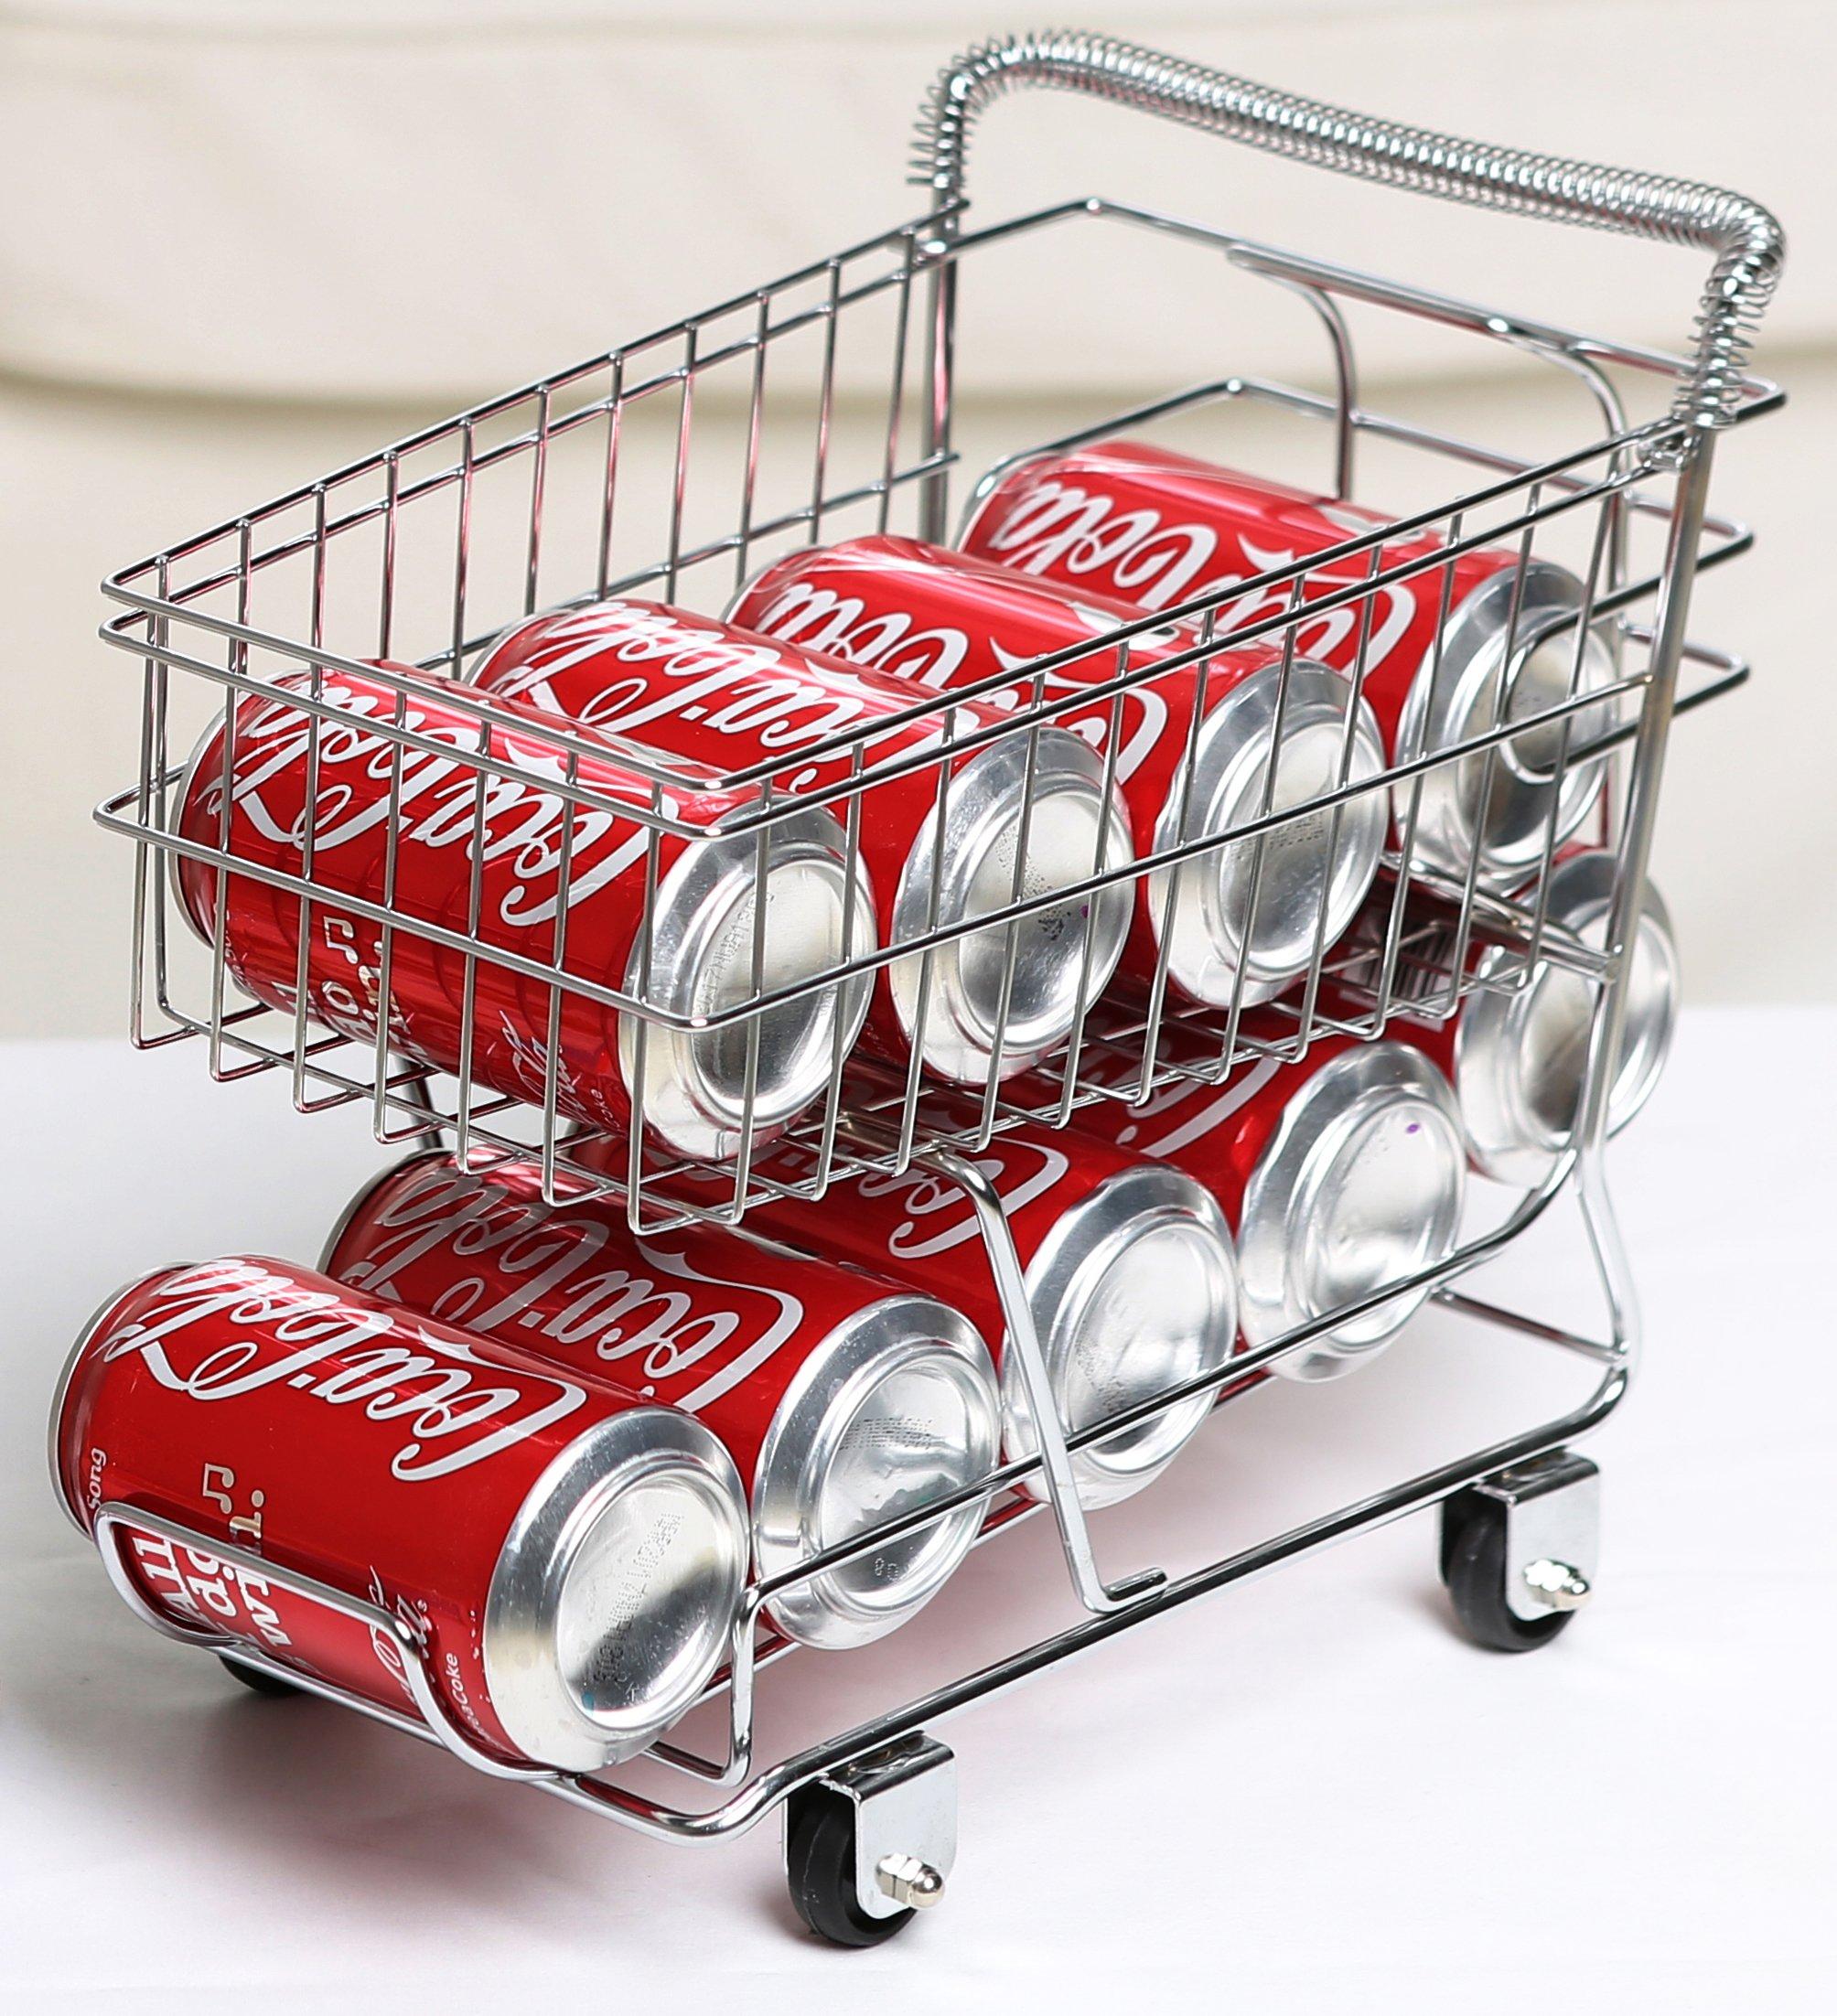 Miniature Shopping Cart Design Can Beverage Storage Rack Holder, Silver